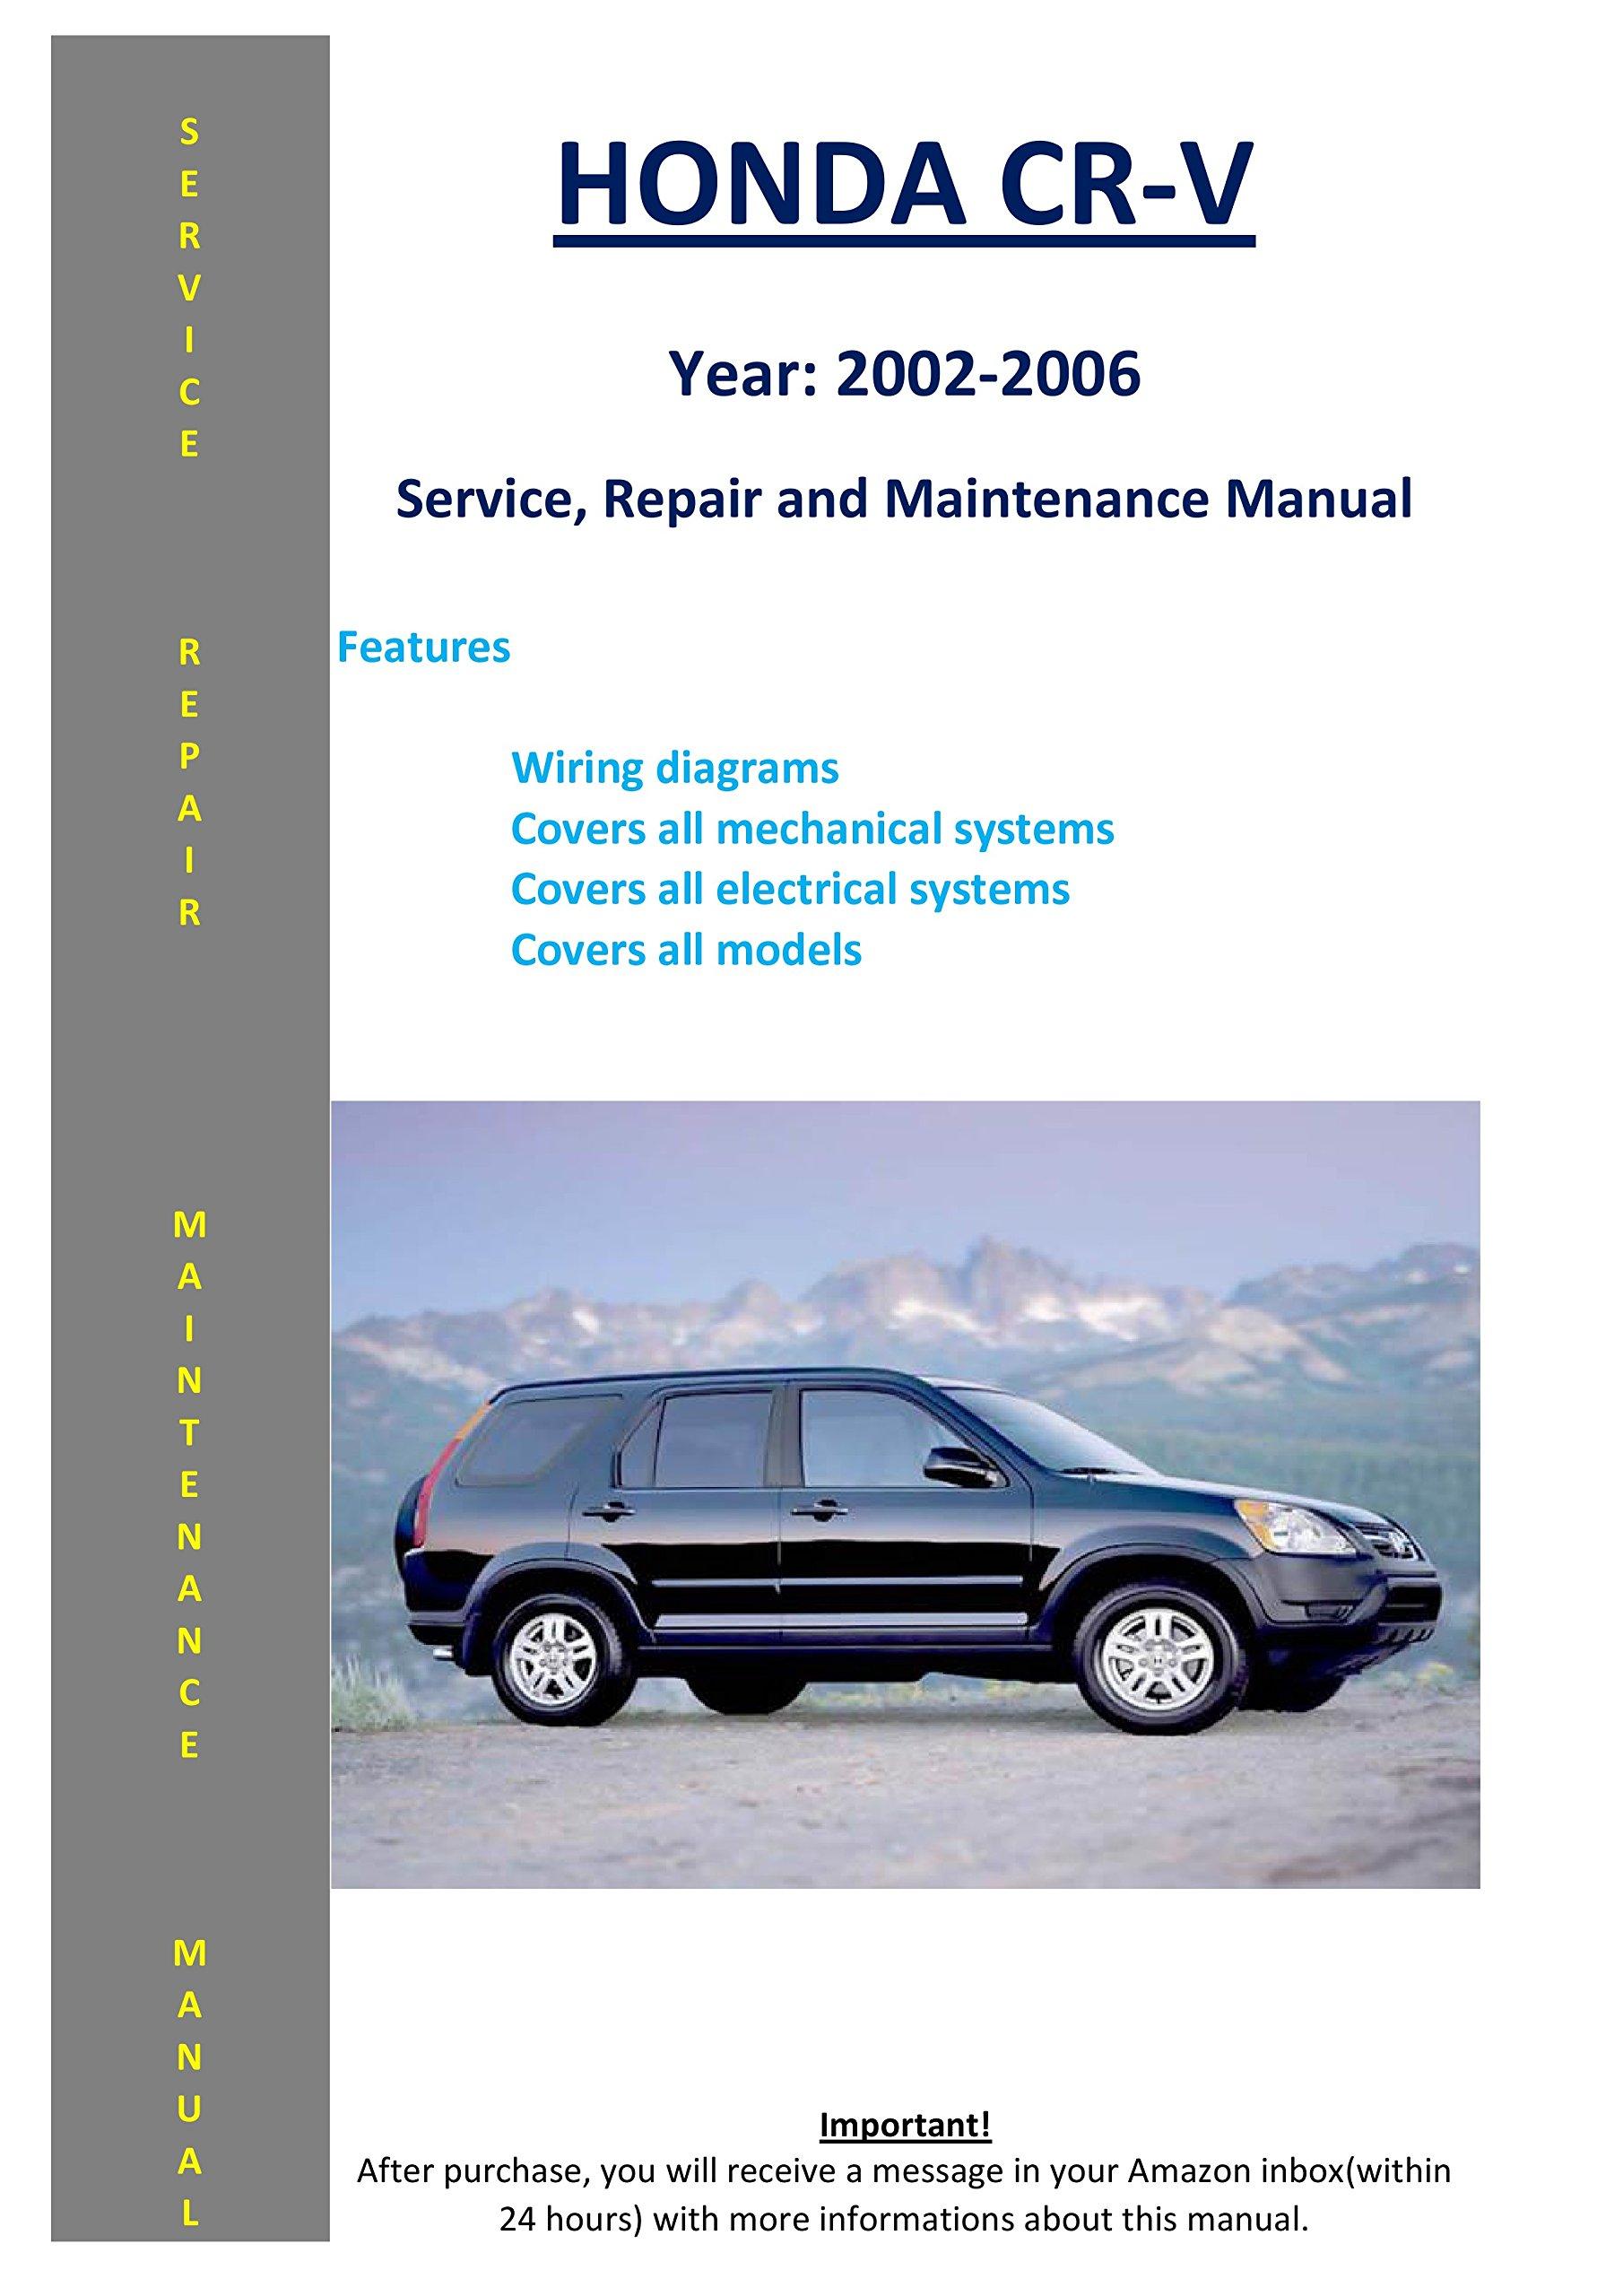 EL_1510] 2002 Honda Crv Wiring Diagram Free Picture Download DiagramGue45 Ologi Emba Mohammedshrine Librar Wiring 101